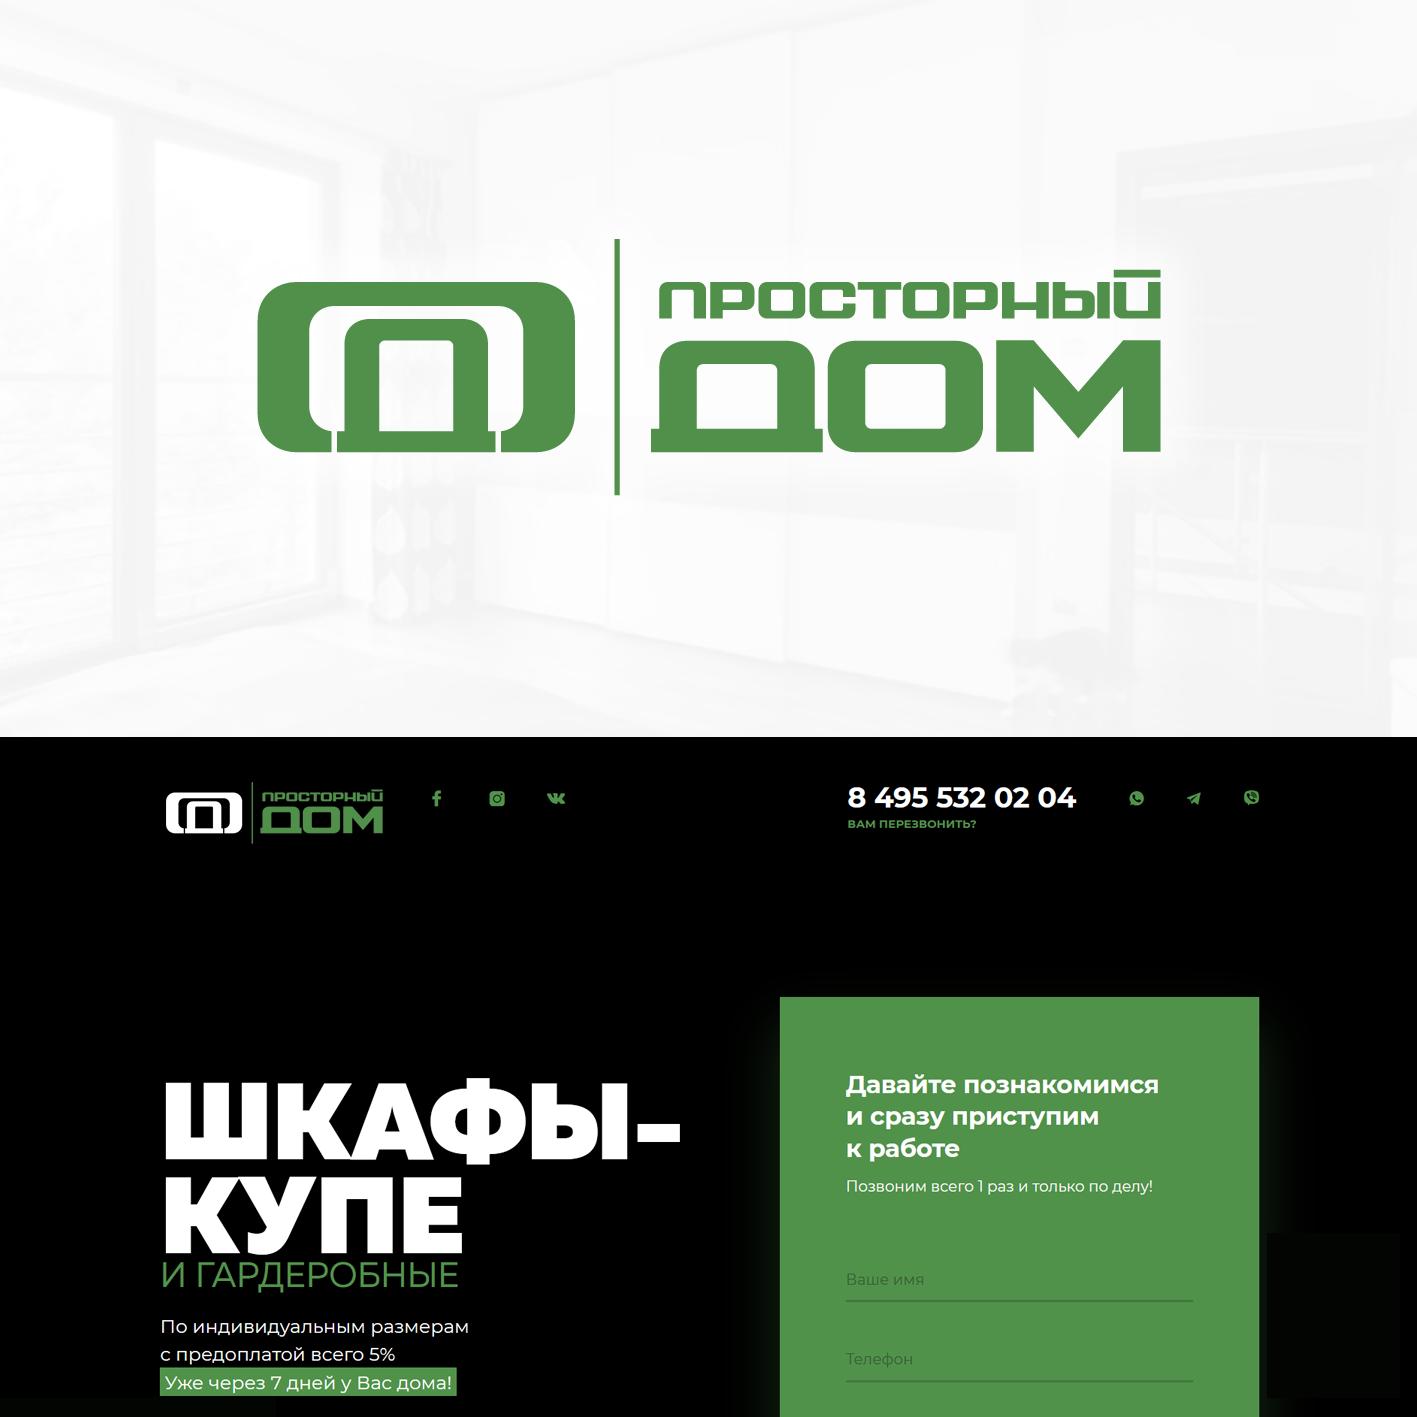 Логотип и фирменный стиль для компании по шкафам-купе фото f_3225b6a2b62d0c6b.png